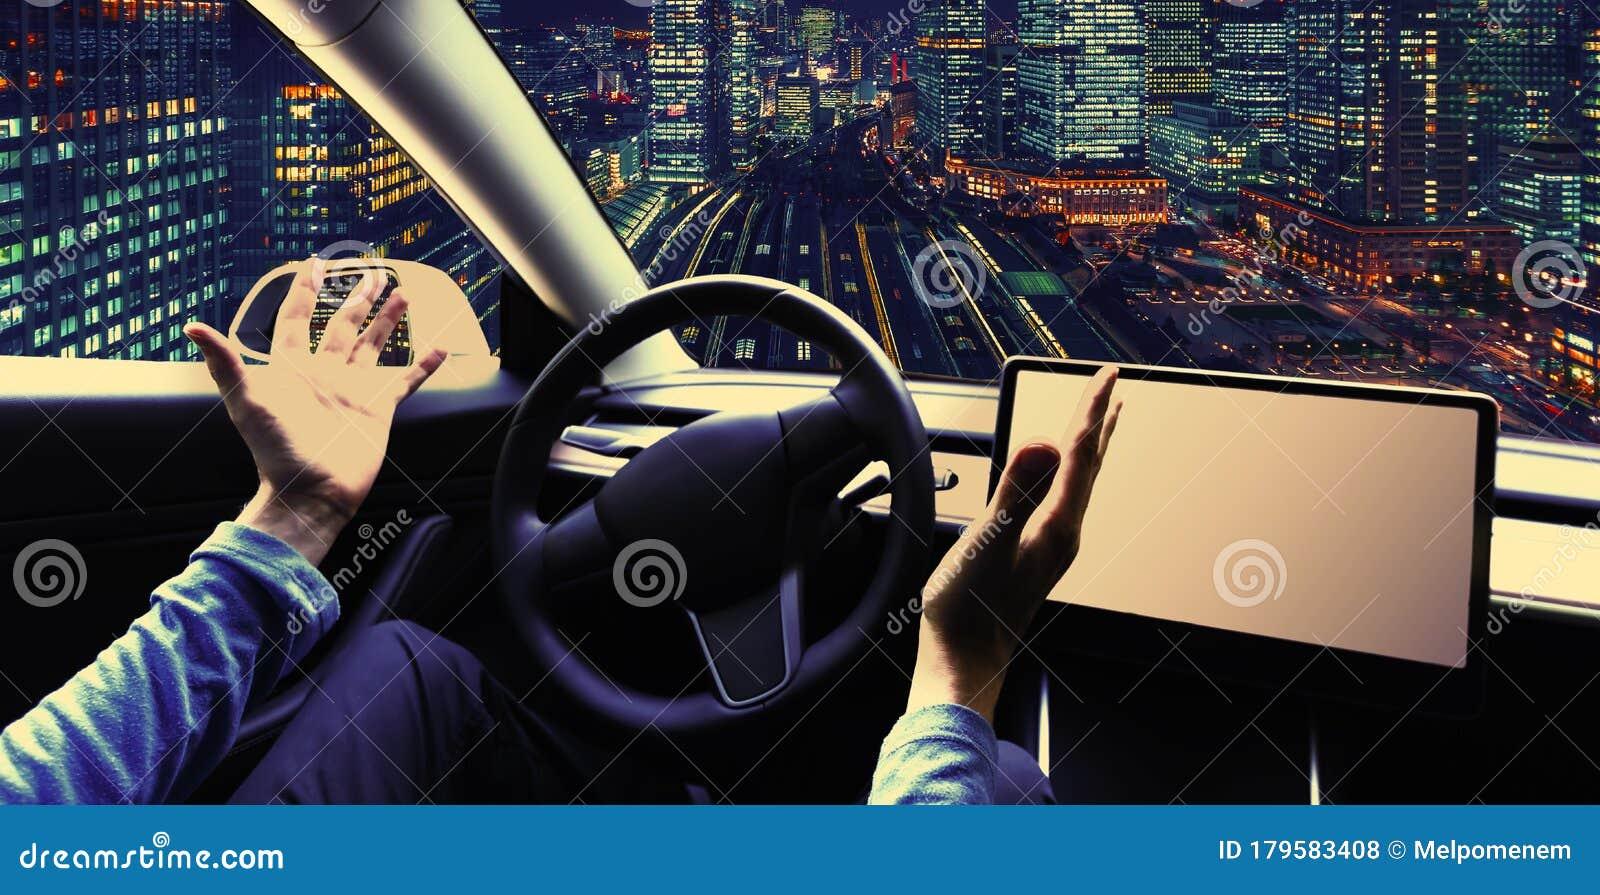 Person Using A Car In Autopilot Mode Stock Photo Image Of Future Artificial 179583408